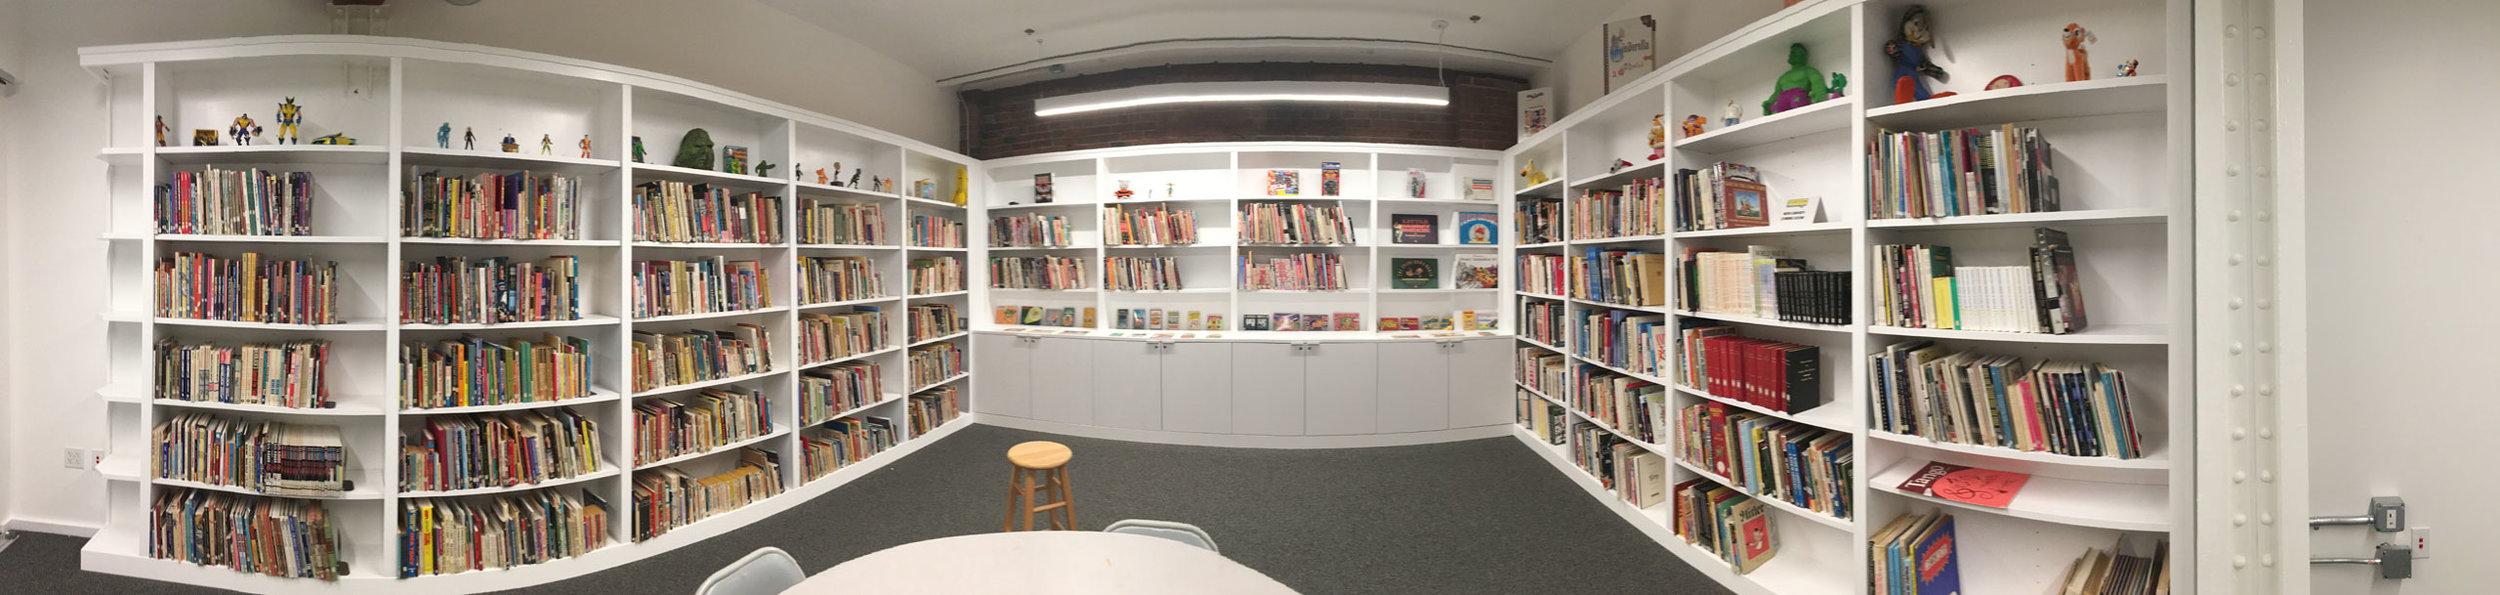 library-wide.jpg